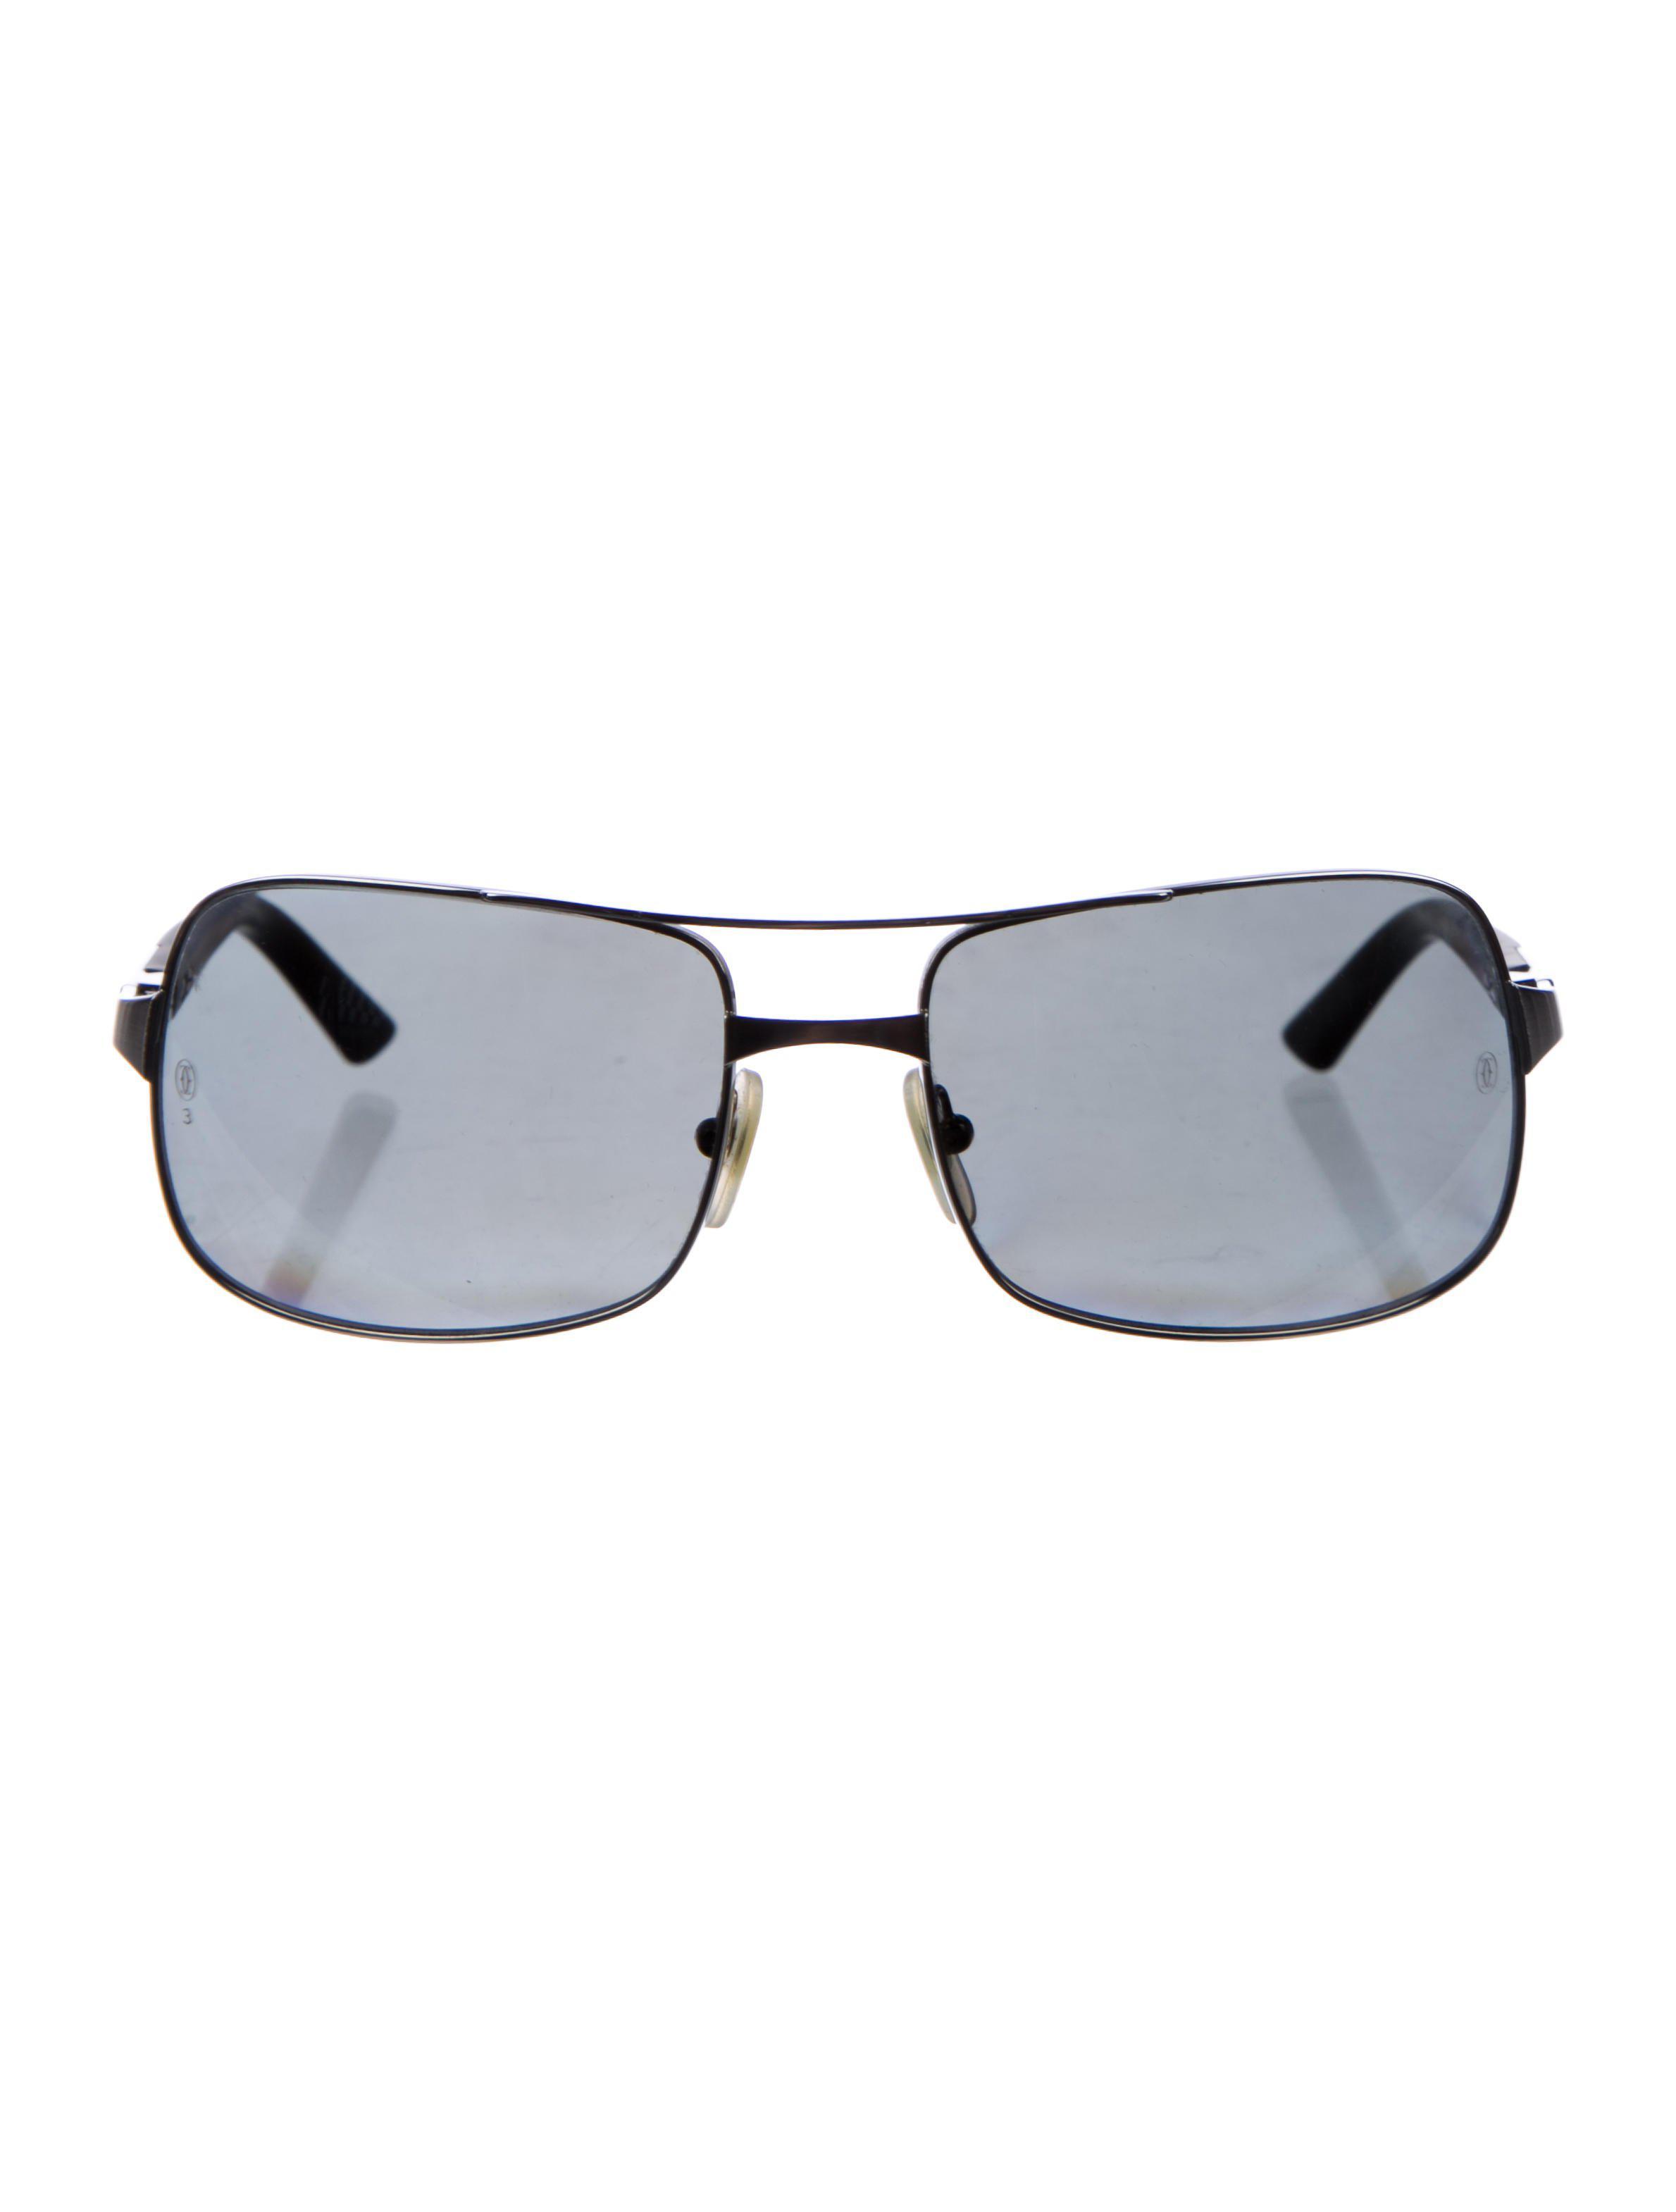 9813ee2d70 Lyst - Cartier Santos Polarized Sunglasses Silver in Metallic